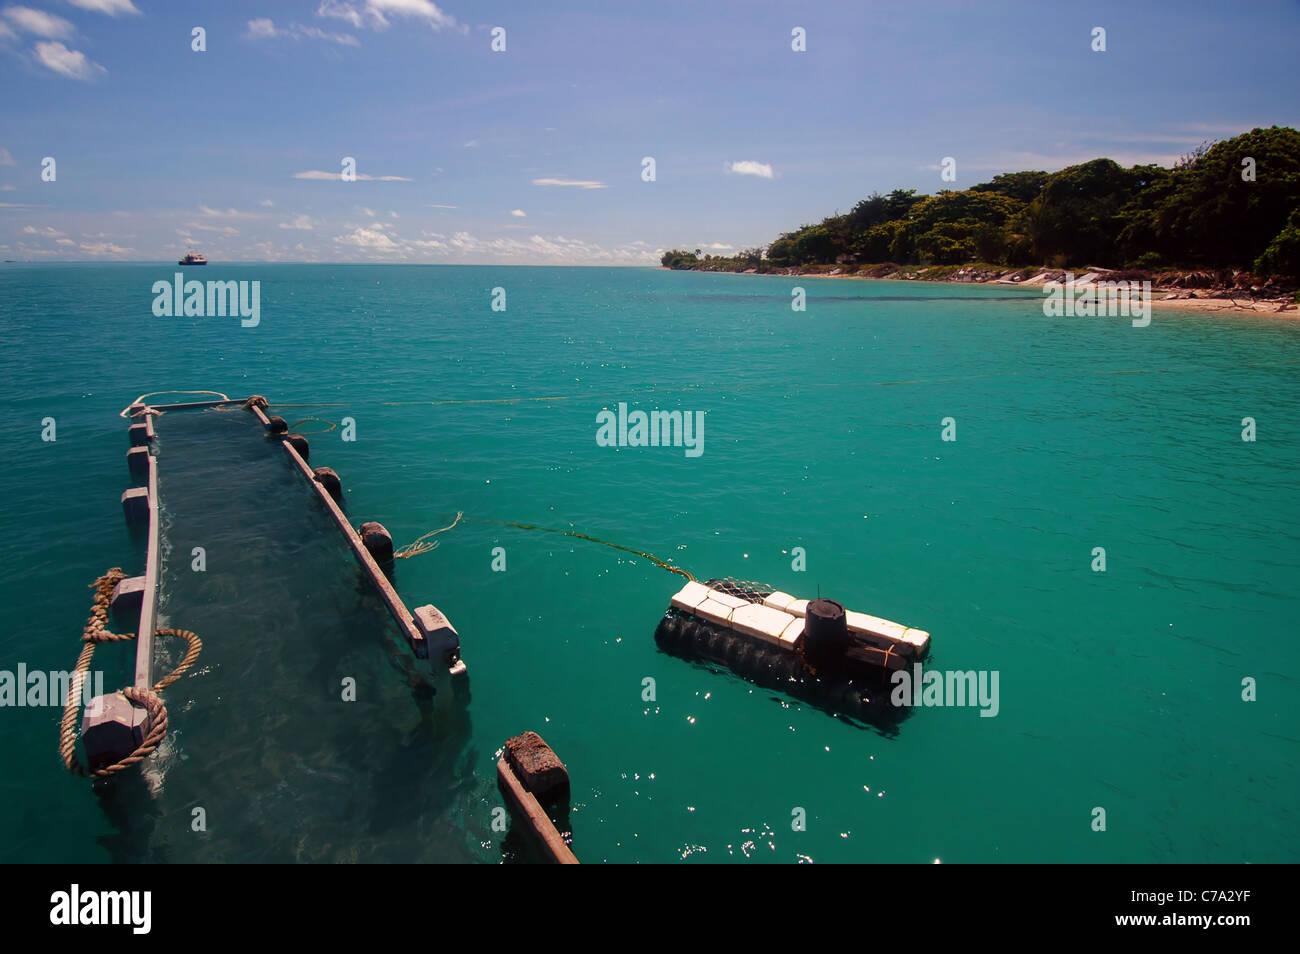 Jetty underwater during king tide at Poruma Island (aka Coconut Stock Photo: 38945187 - Alamy